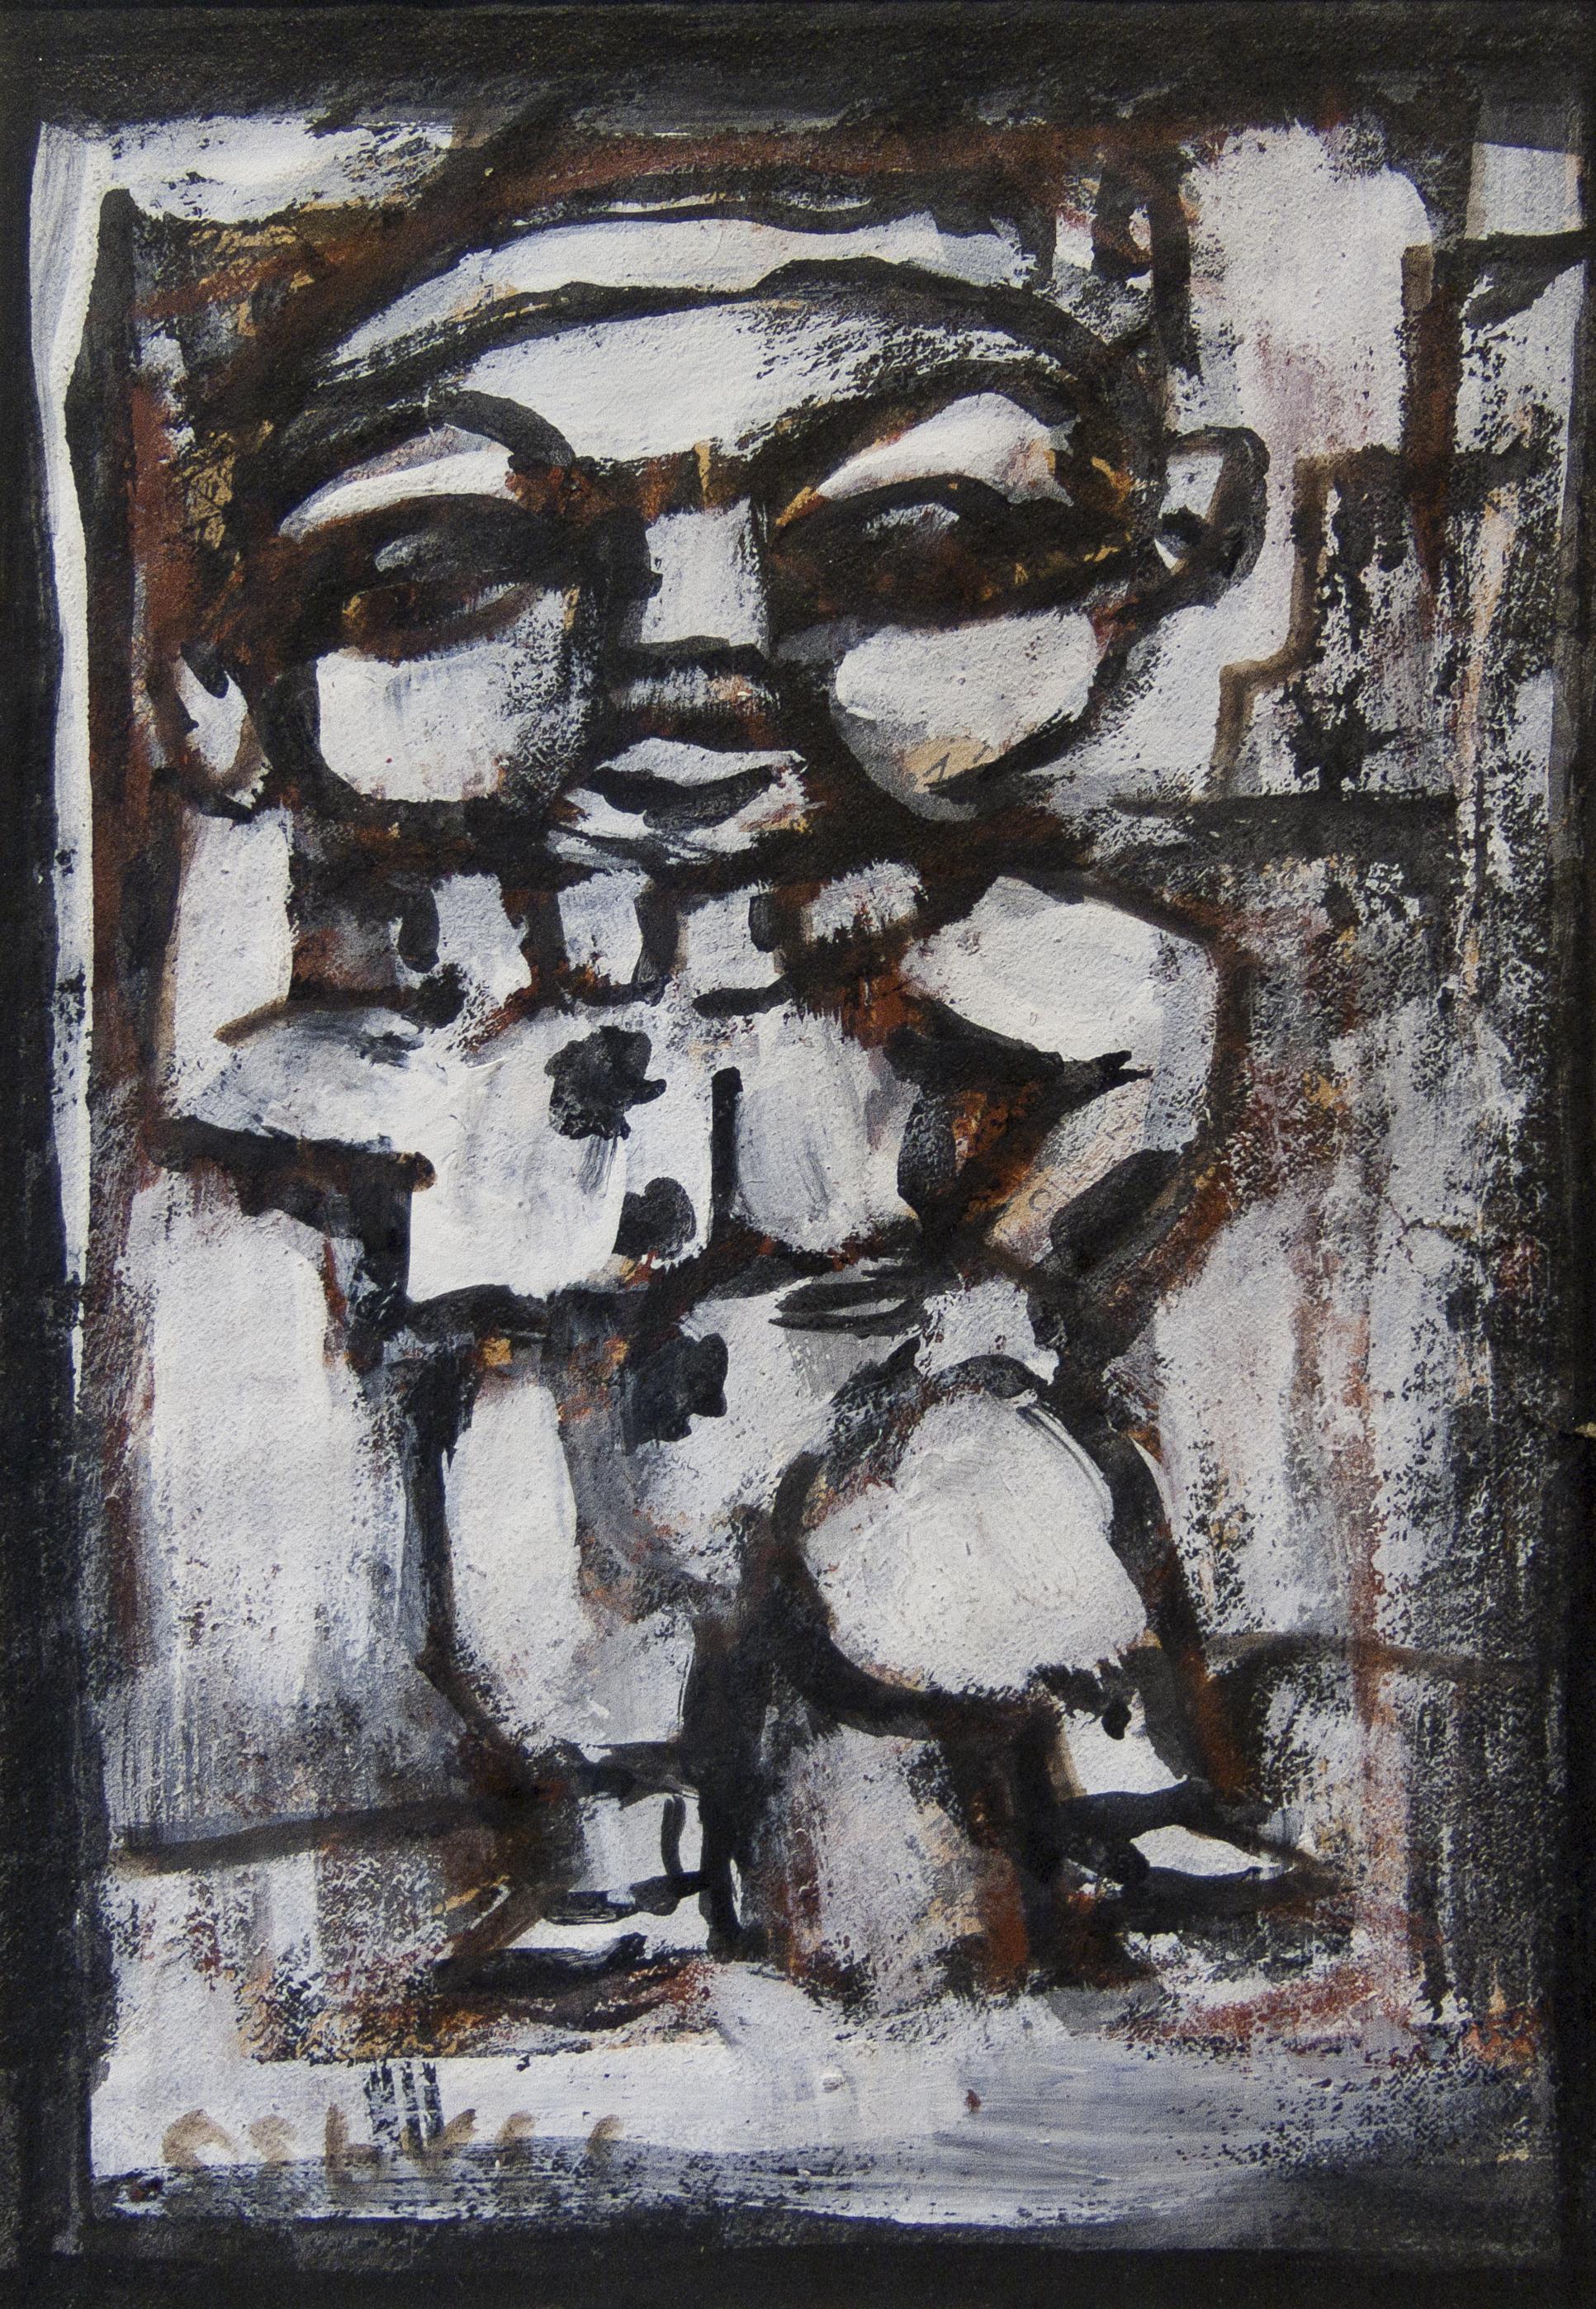 Untitled (Saltimbanque)